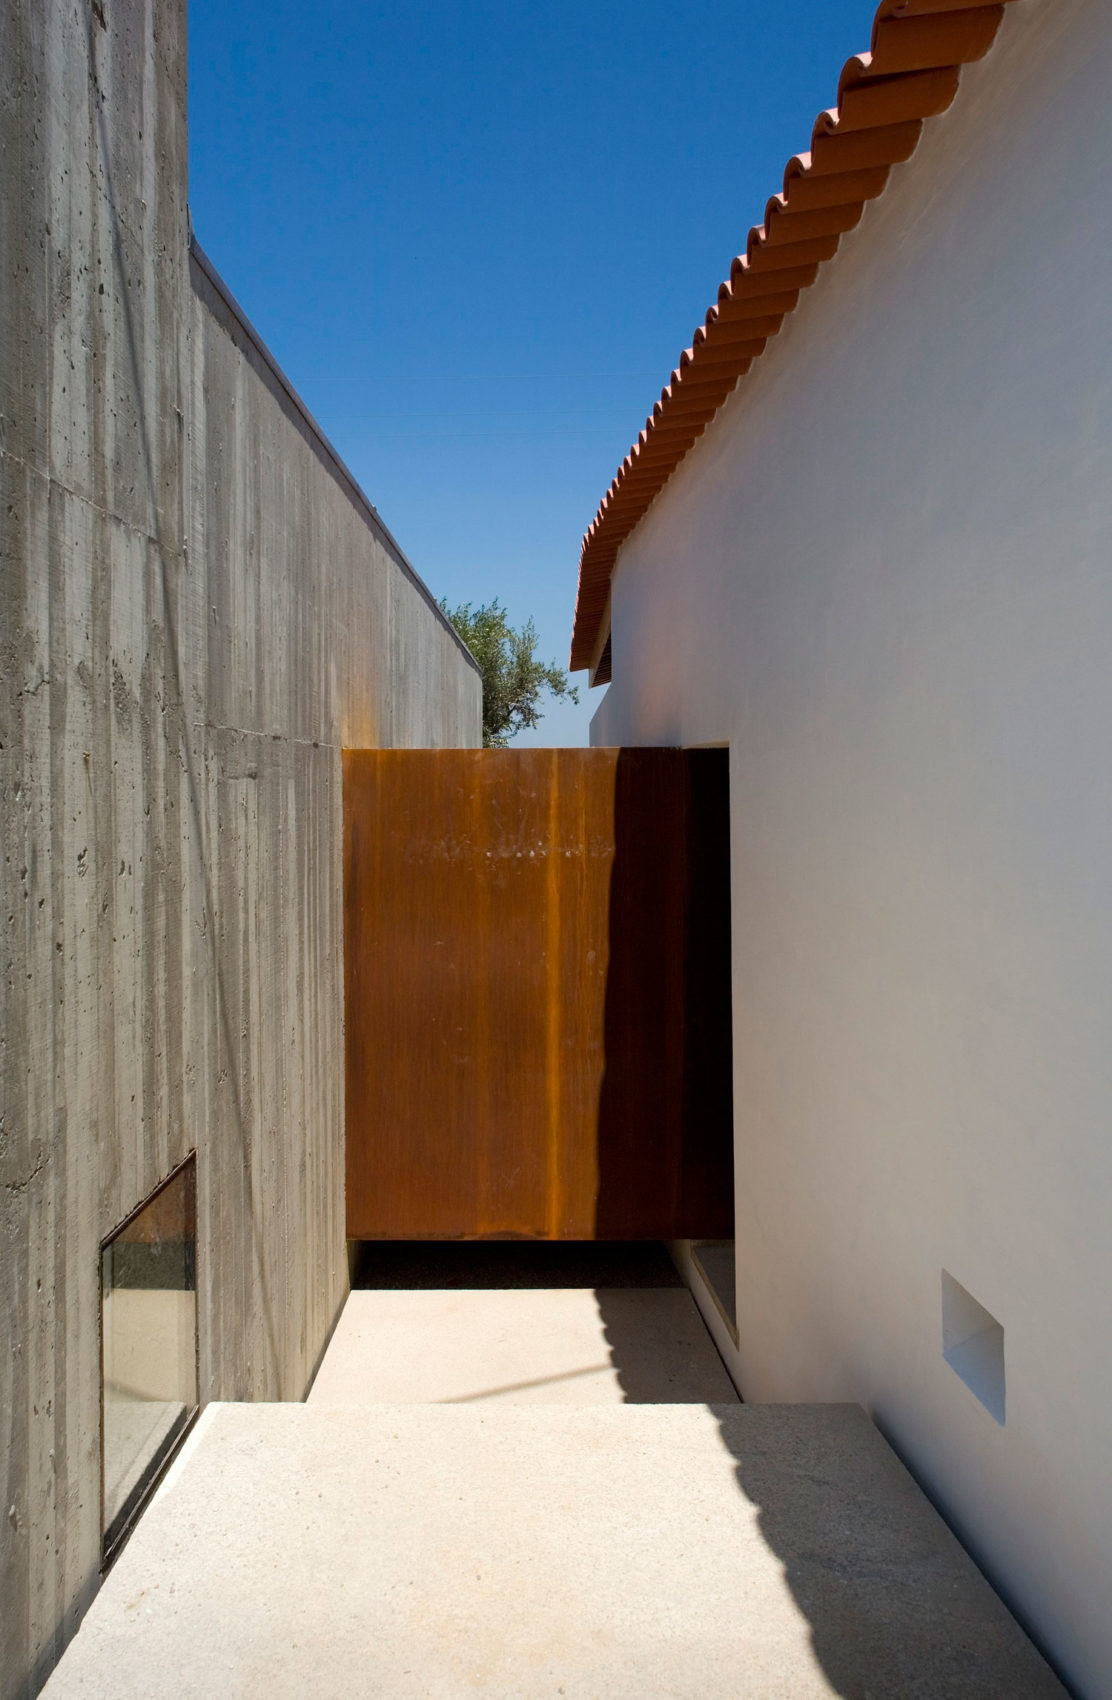 House in Chamusca Da Beira by João Mendes Ribeiro (11)